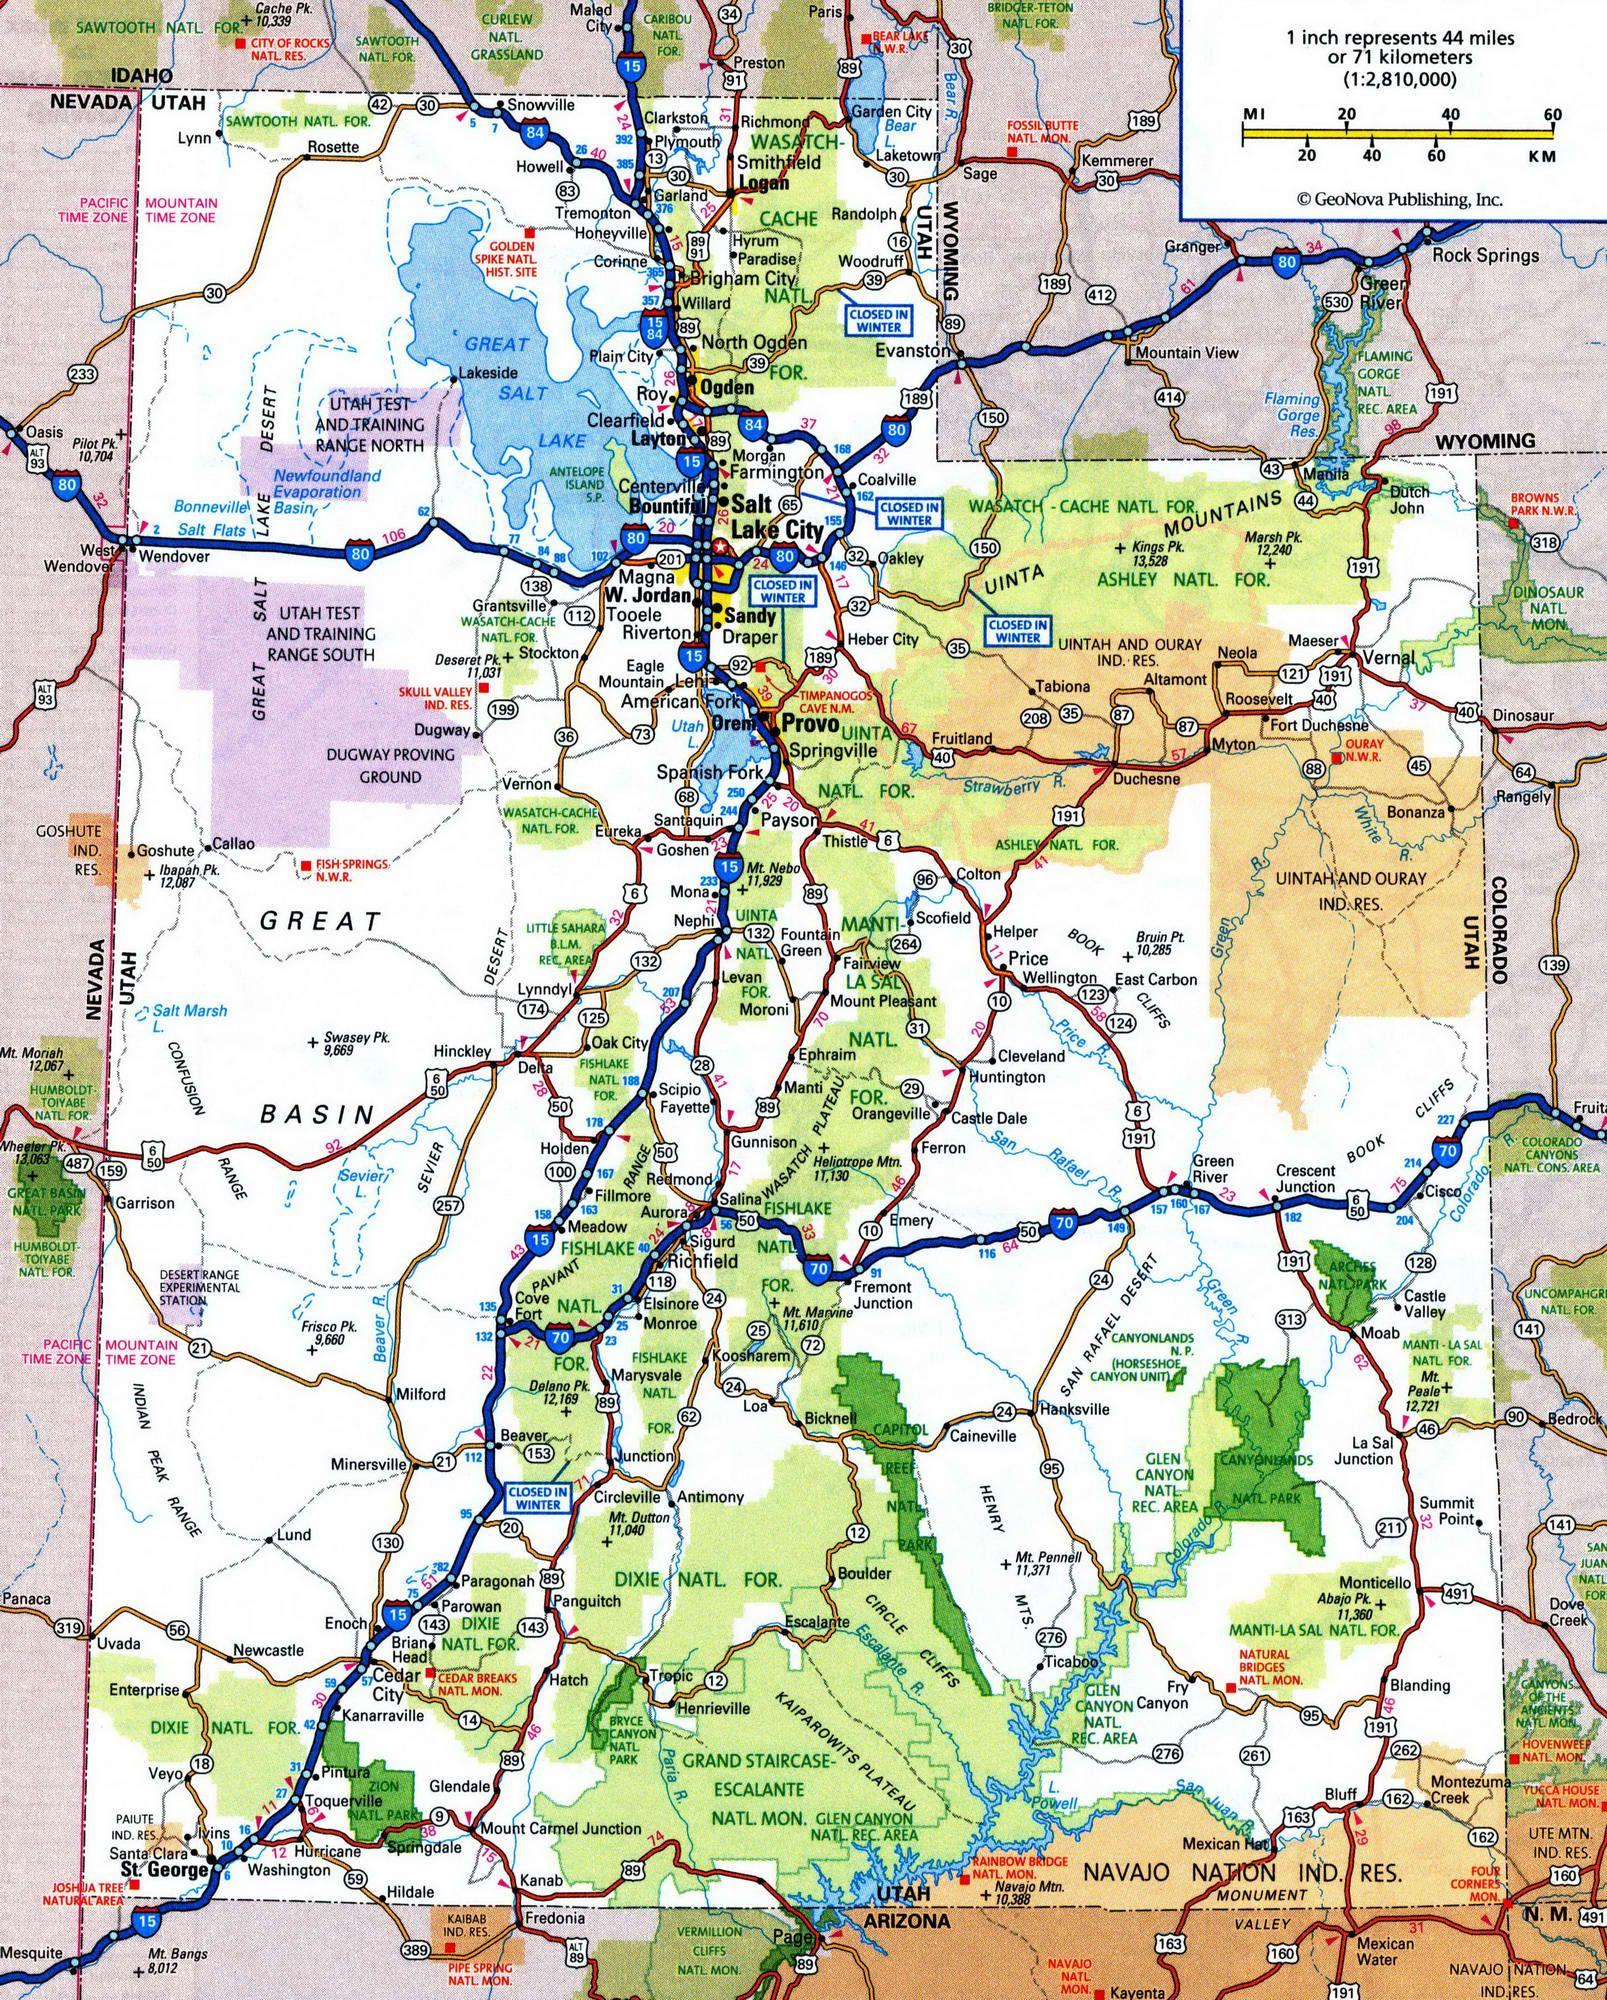 Highway and road of Utah Free maps of US TravelUS12 Utah